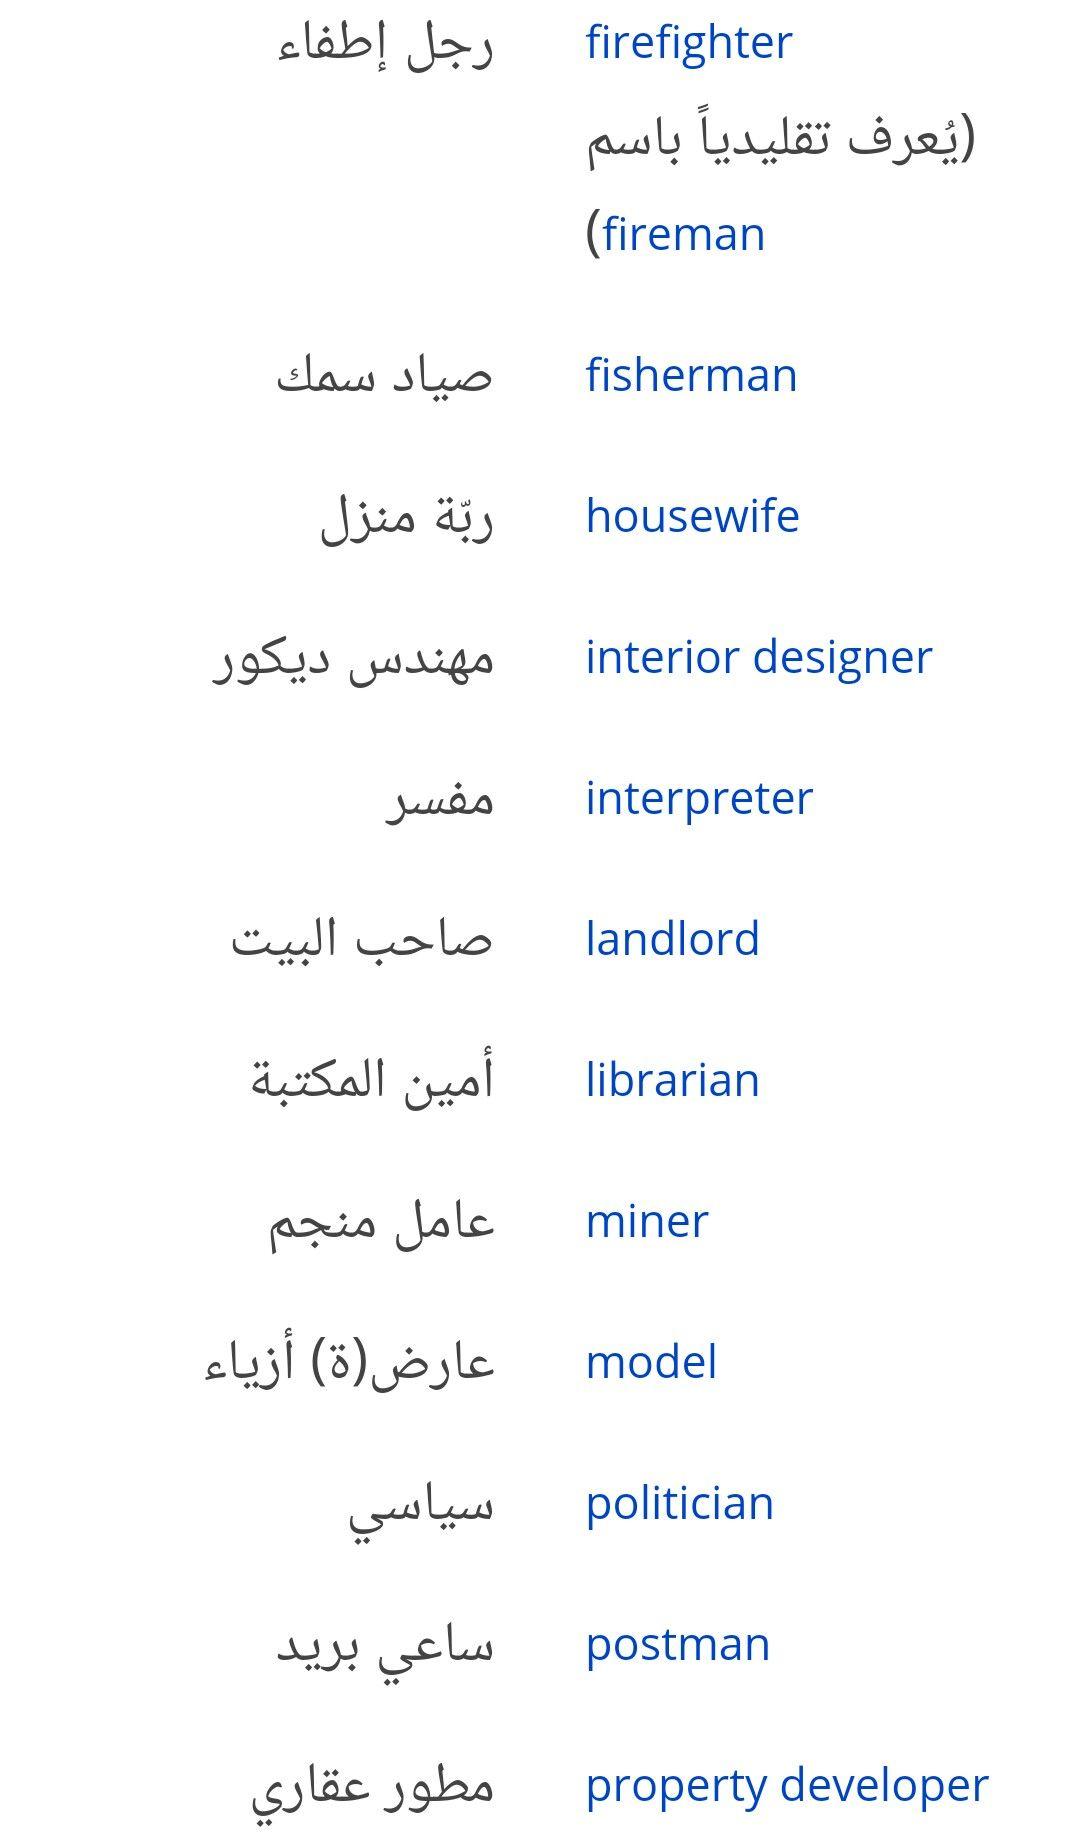 Pin By Rose Gholson On Arabic English Language Learning Grammar Arabic To English Translation Learn Arabic Language